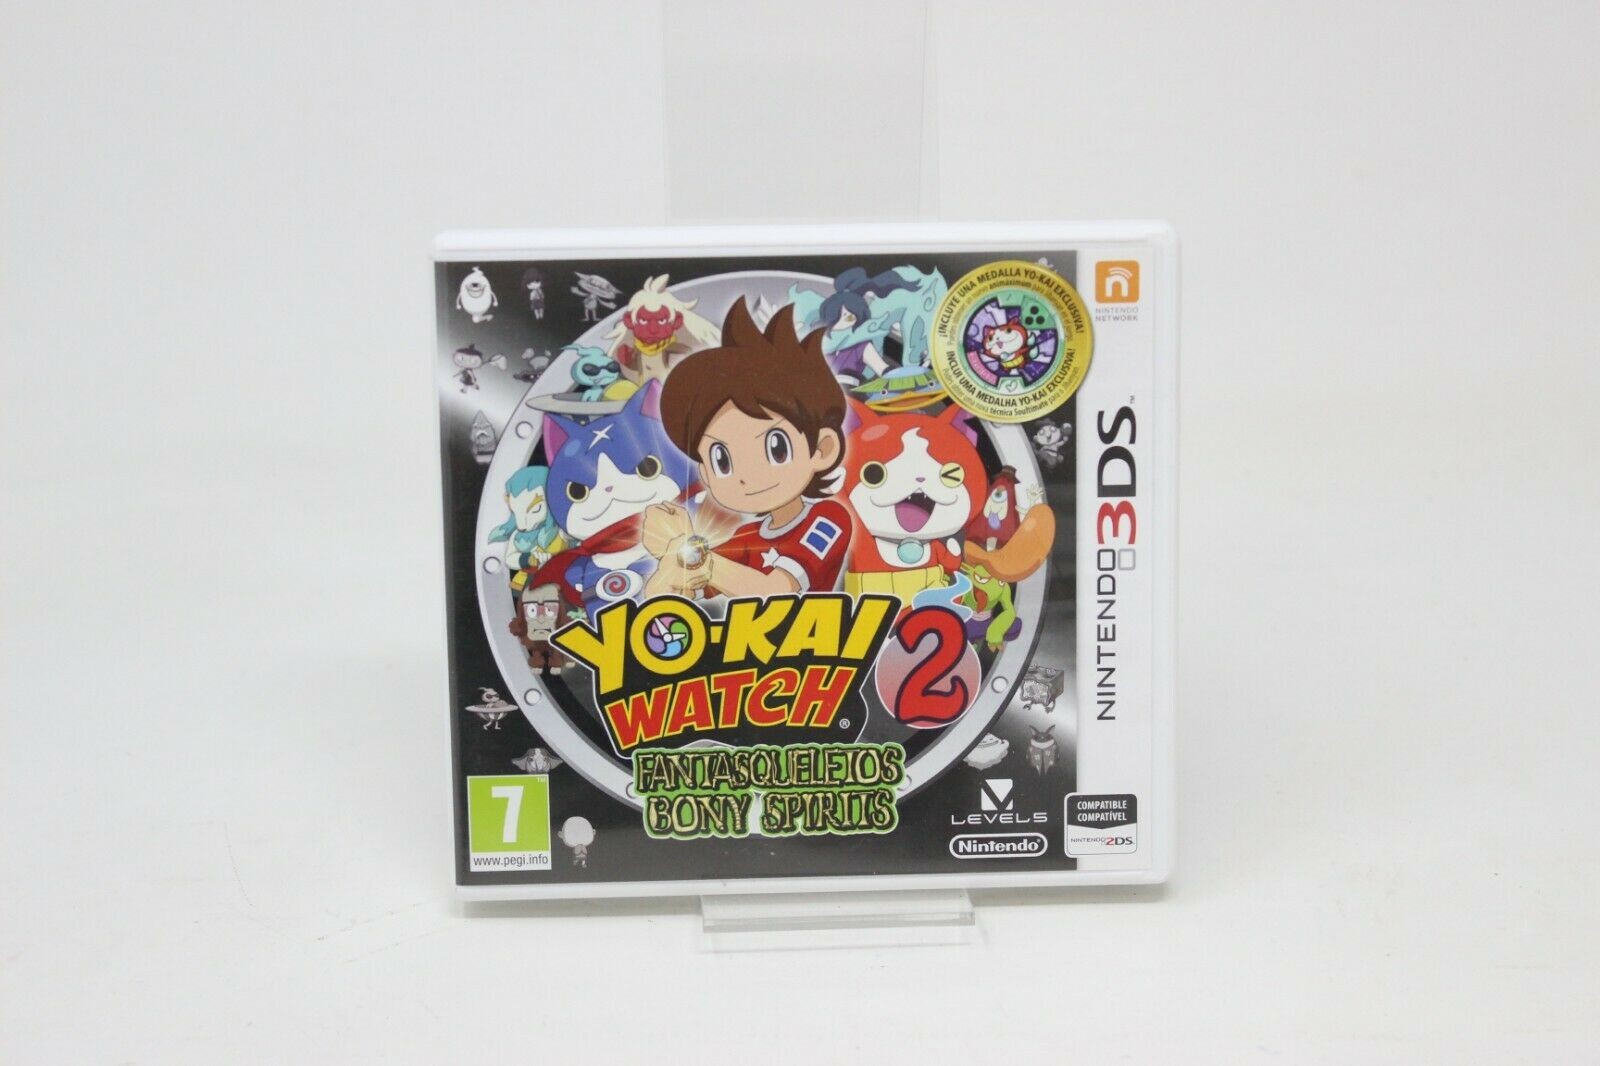 YO KAI WATCH 2 FANTASQUELETOS NINTENDO 3DS 2DS inv-74467